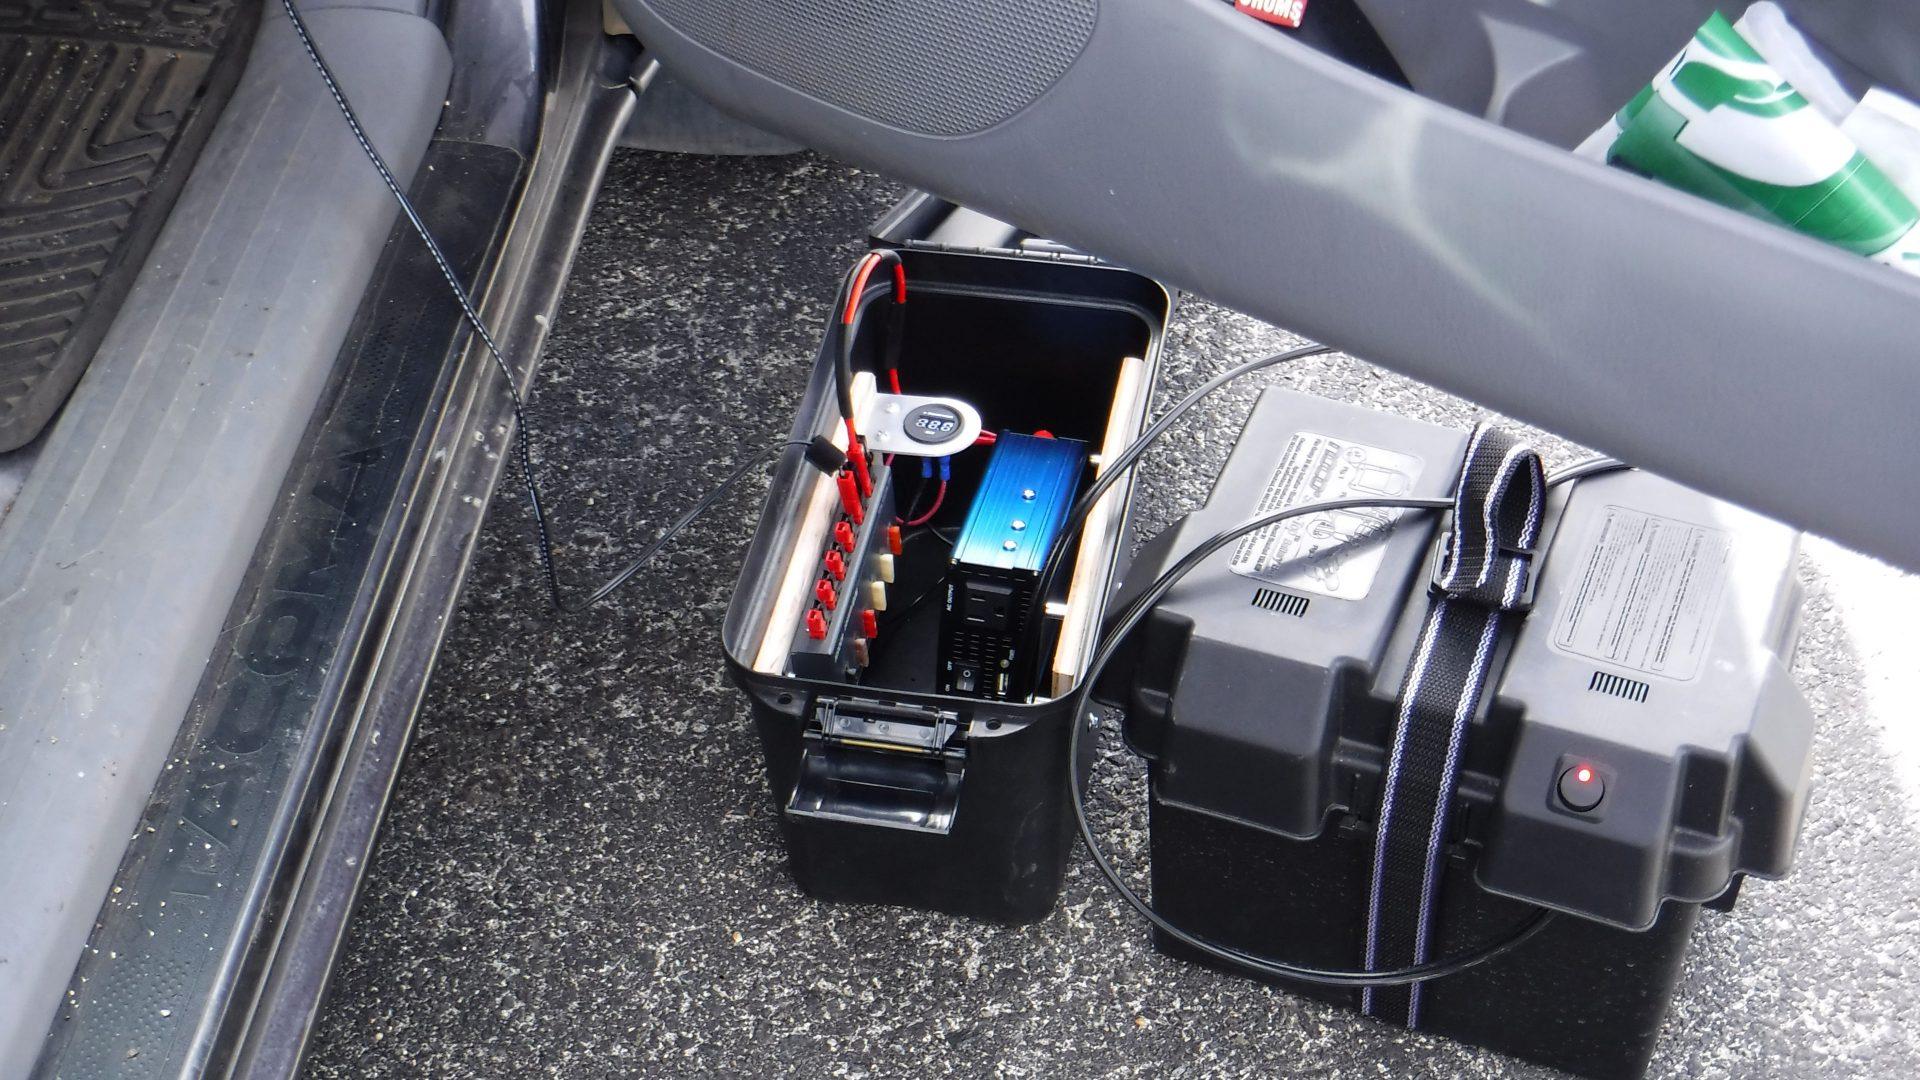 Ham radio portable power supply and inverter